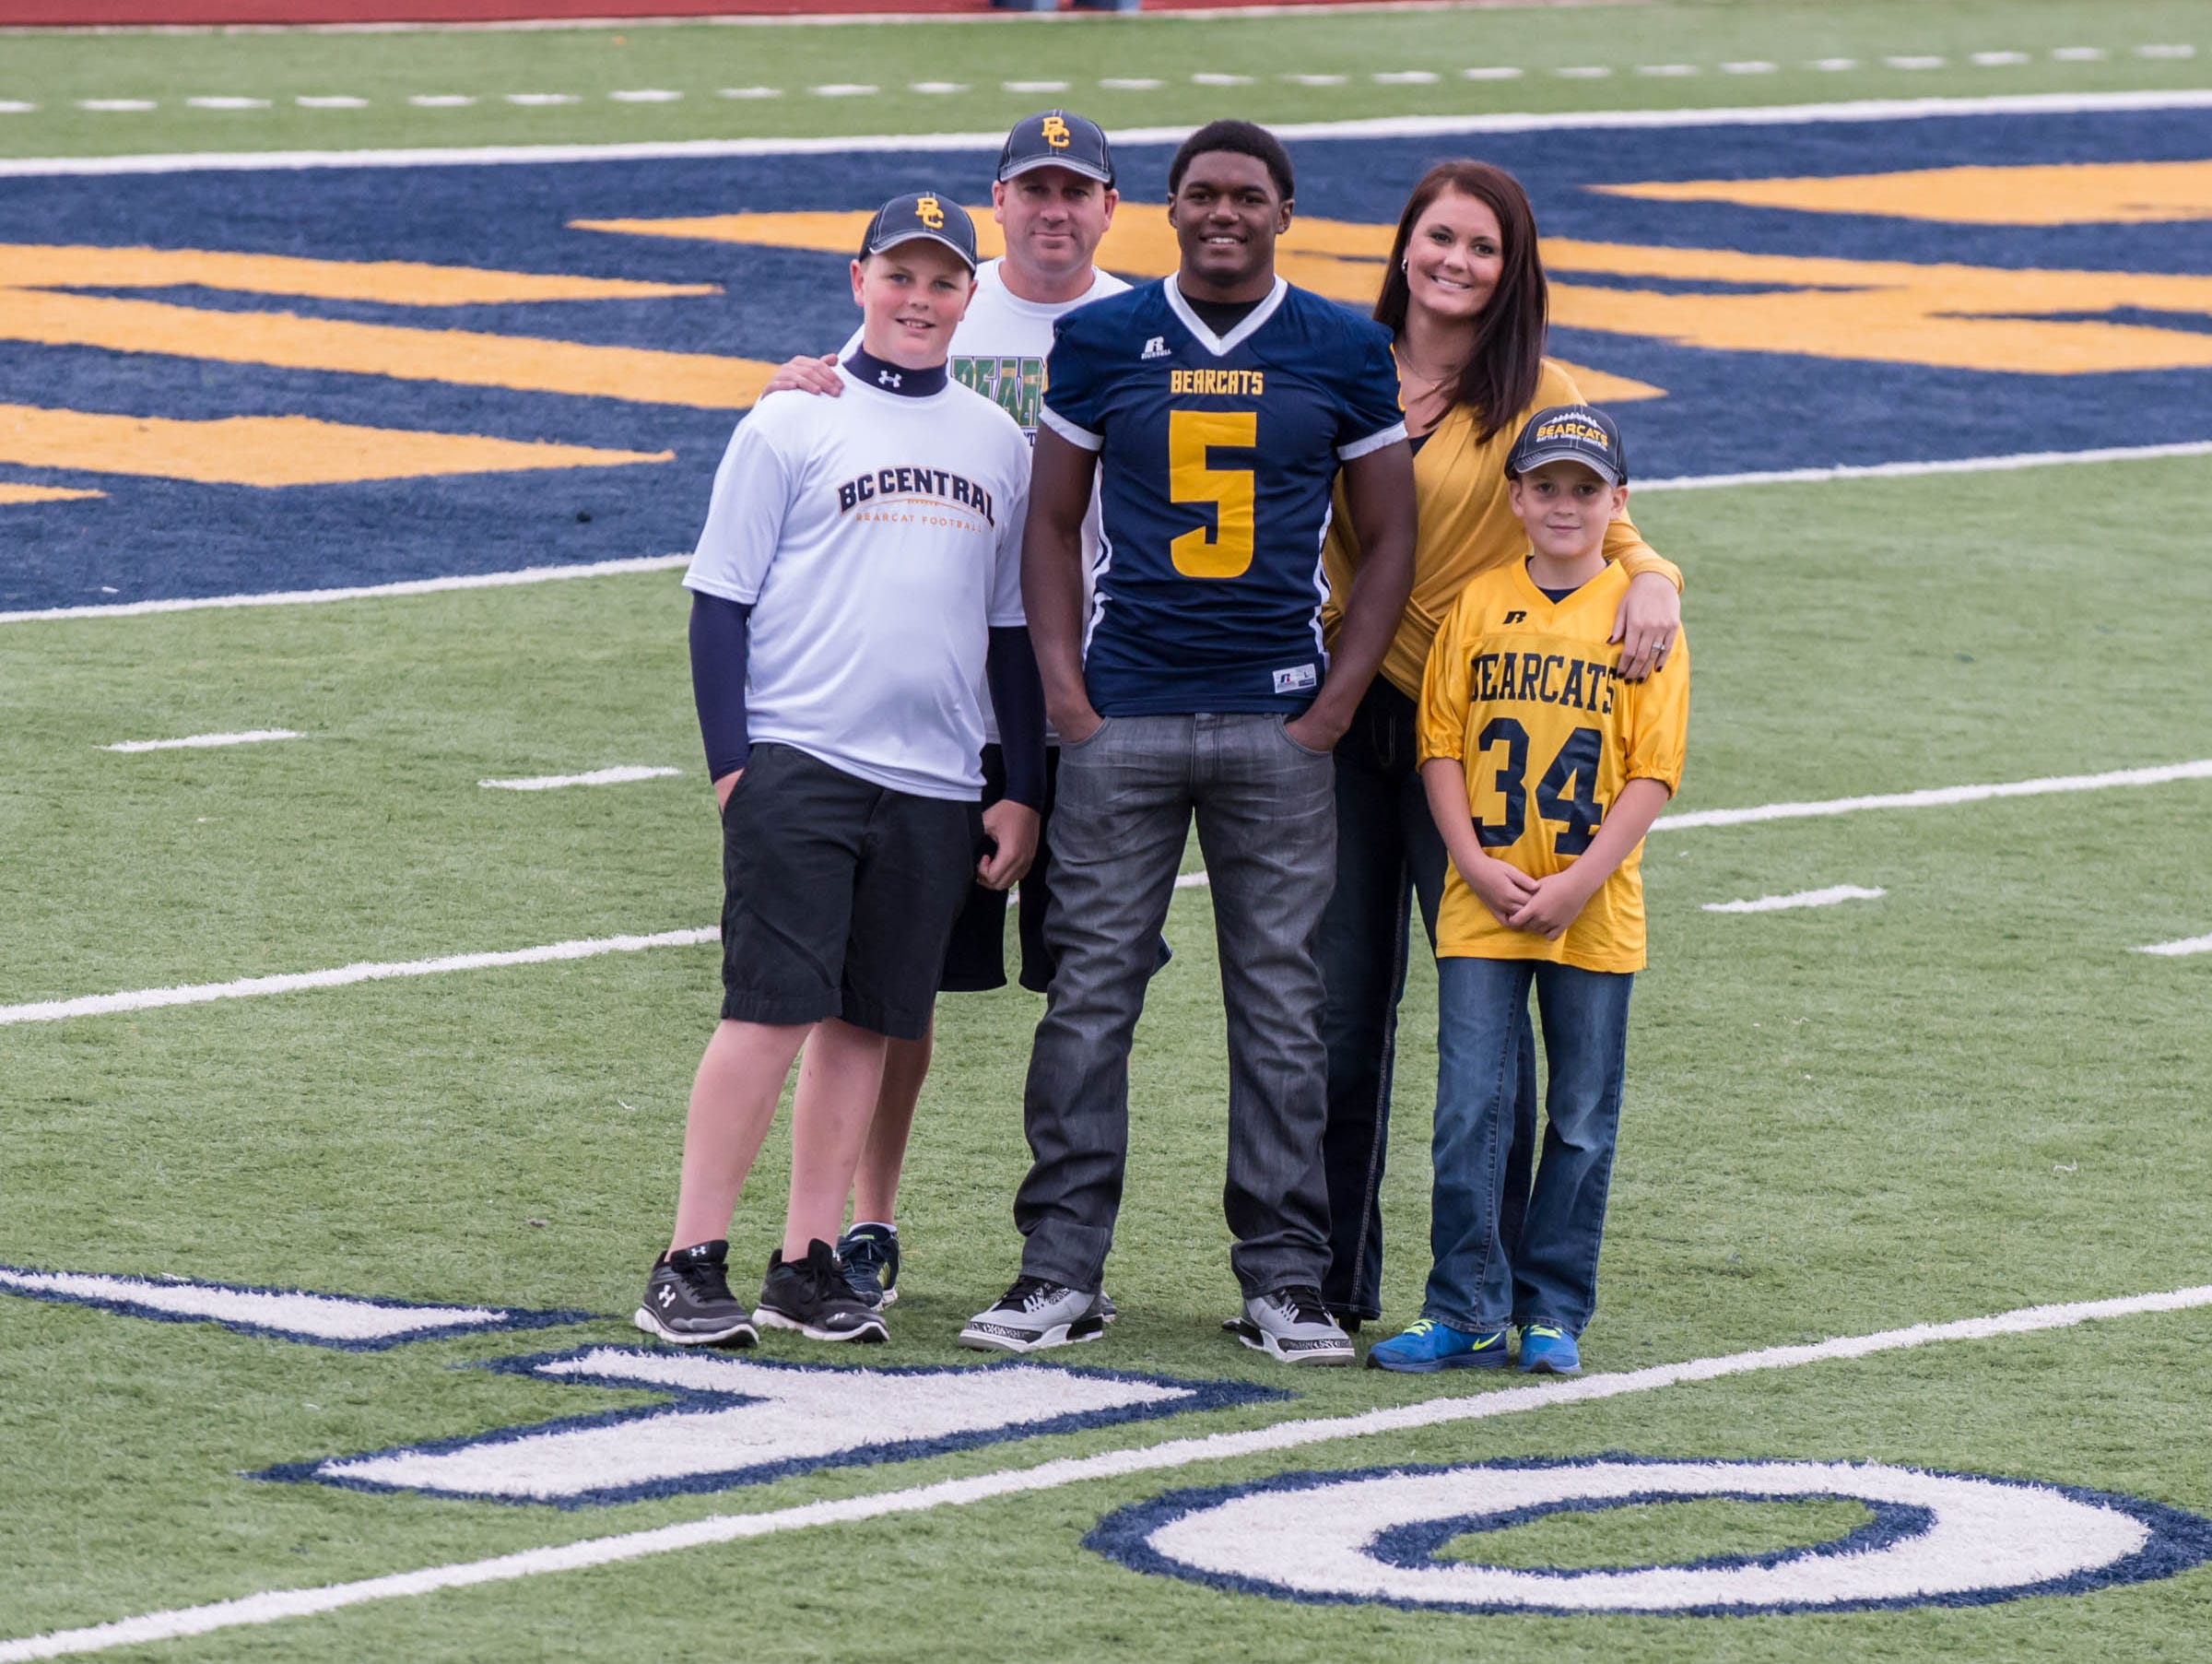 Battle Creek Central football standout Brandon Randle, with his surrogate family - BCC head coach Lorin Granger, his wife Audra Granger, Kyler Granger and Kayden Granger.